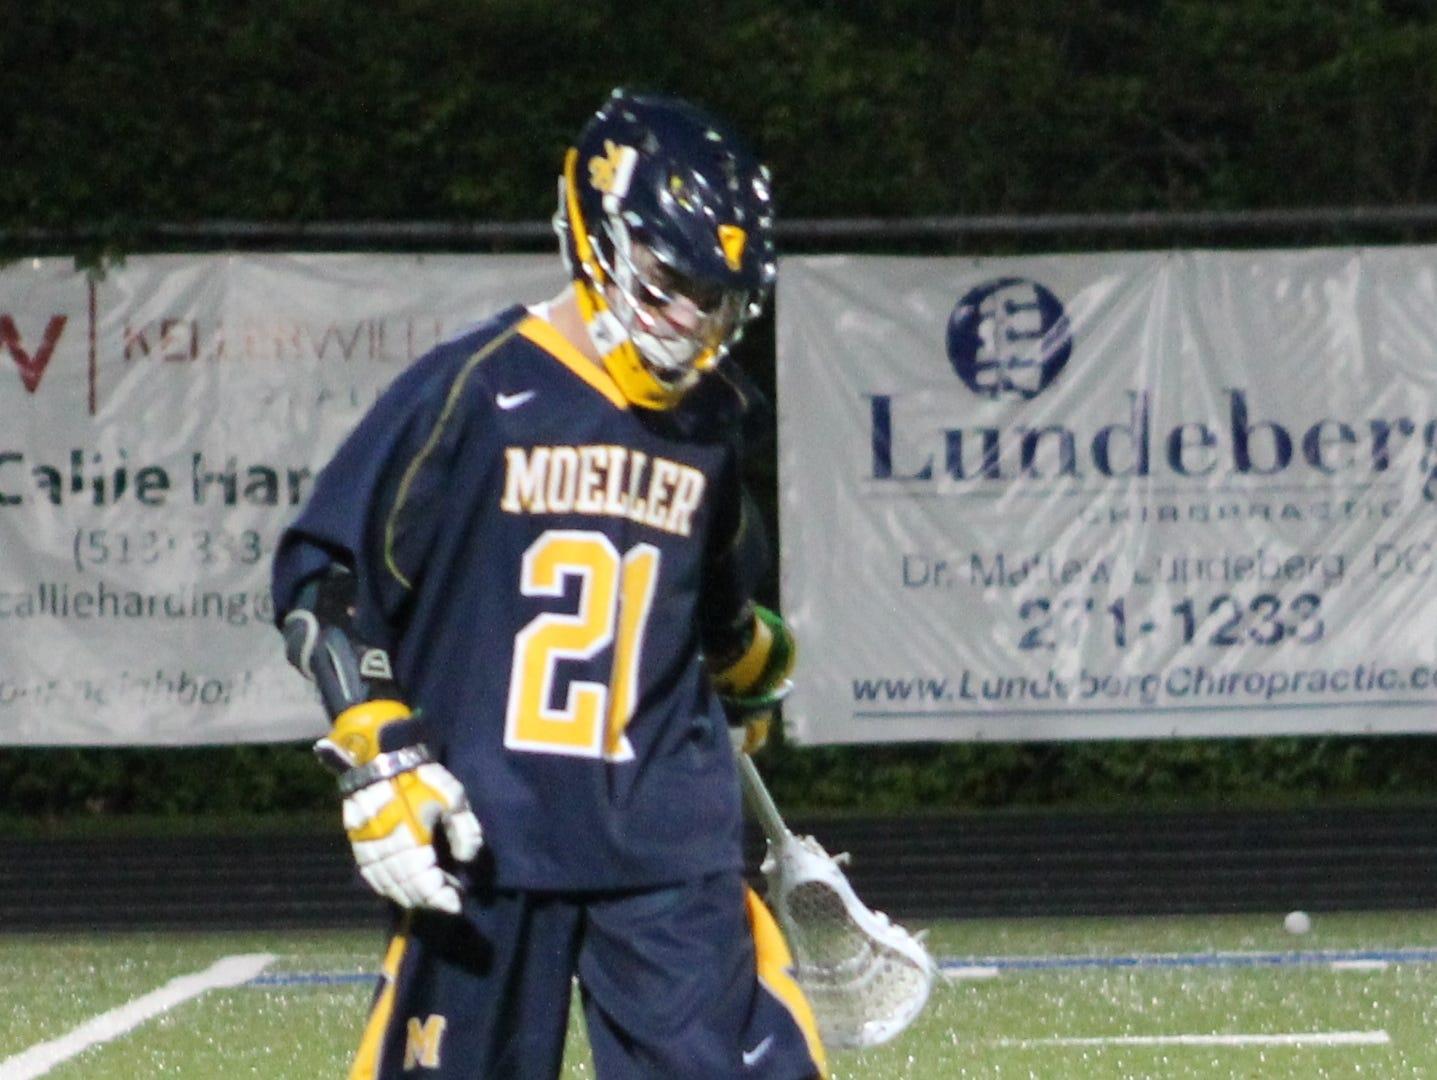 Moeller senior Grady Quinn walks off after a Crusader goal.